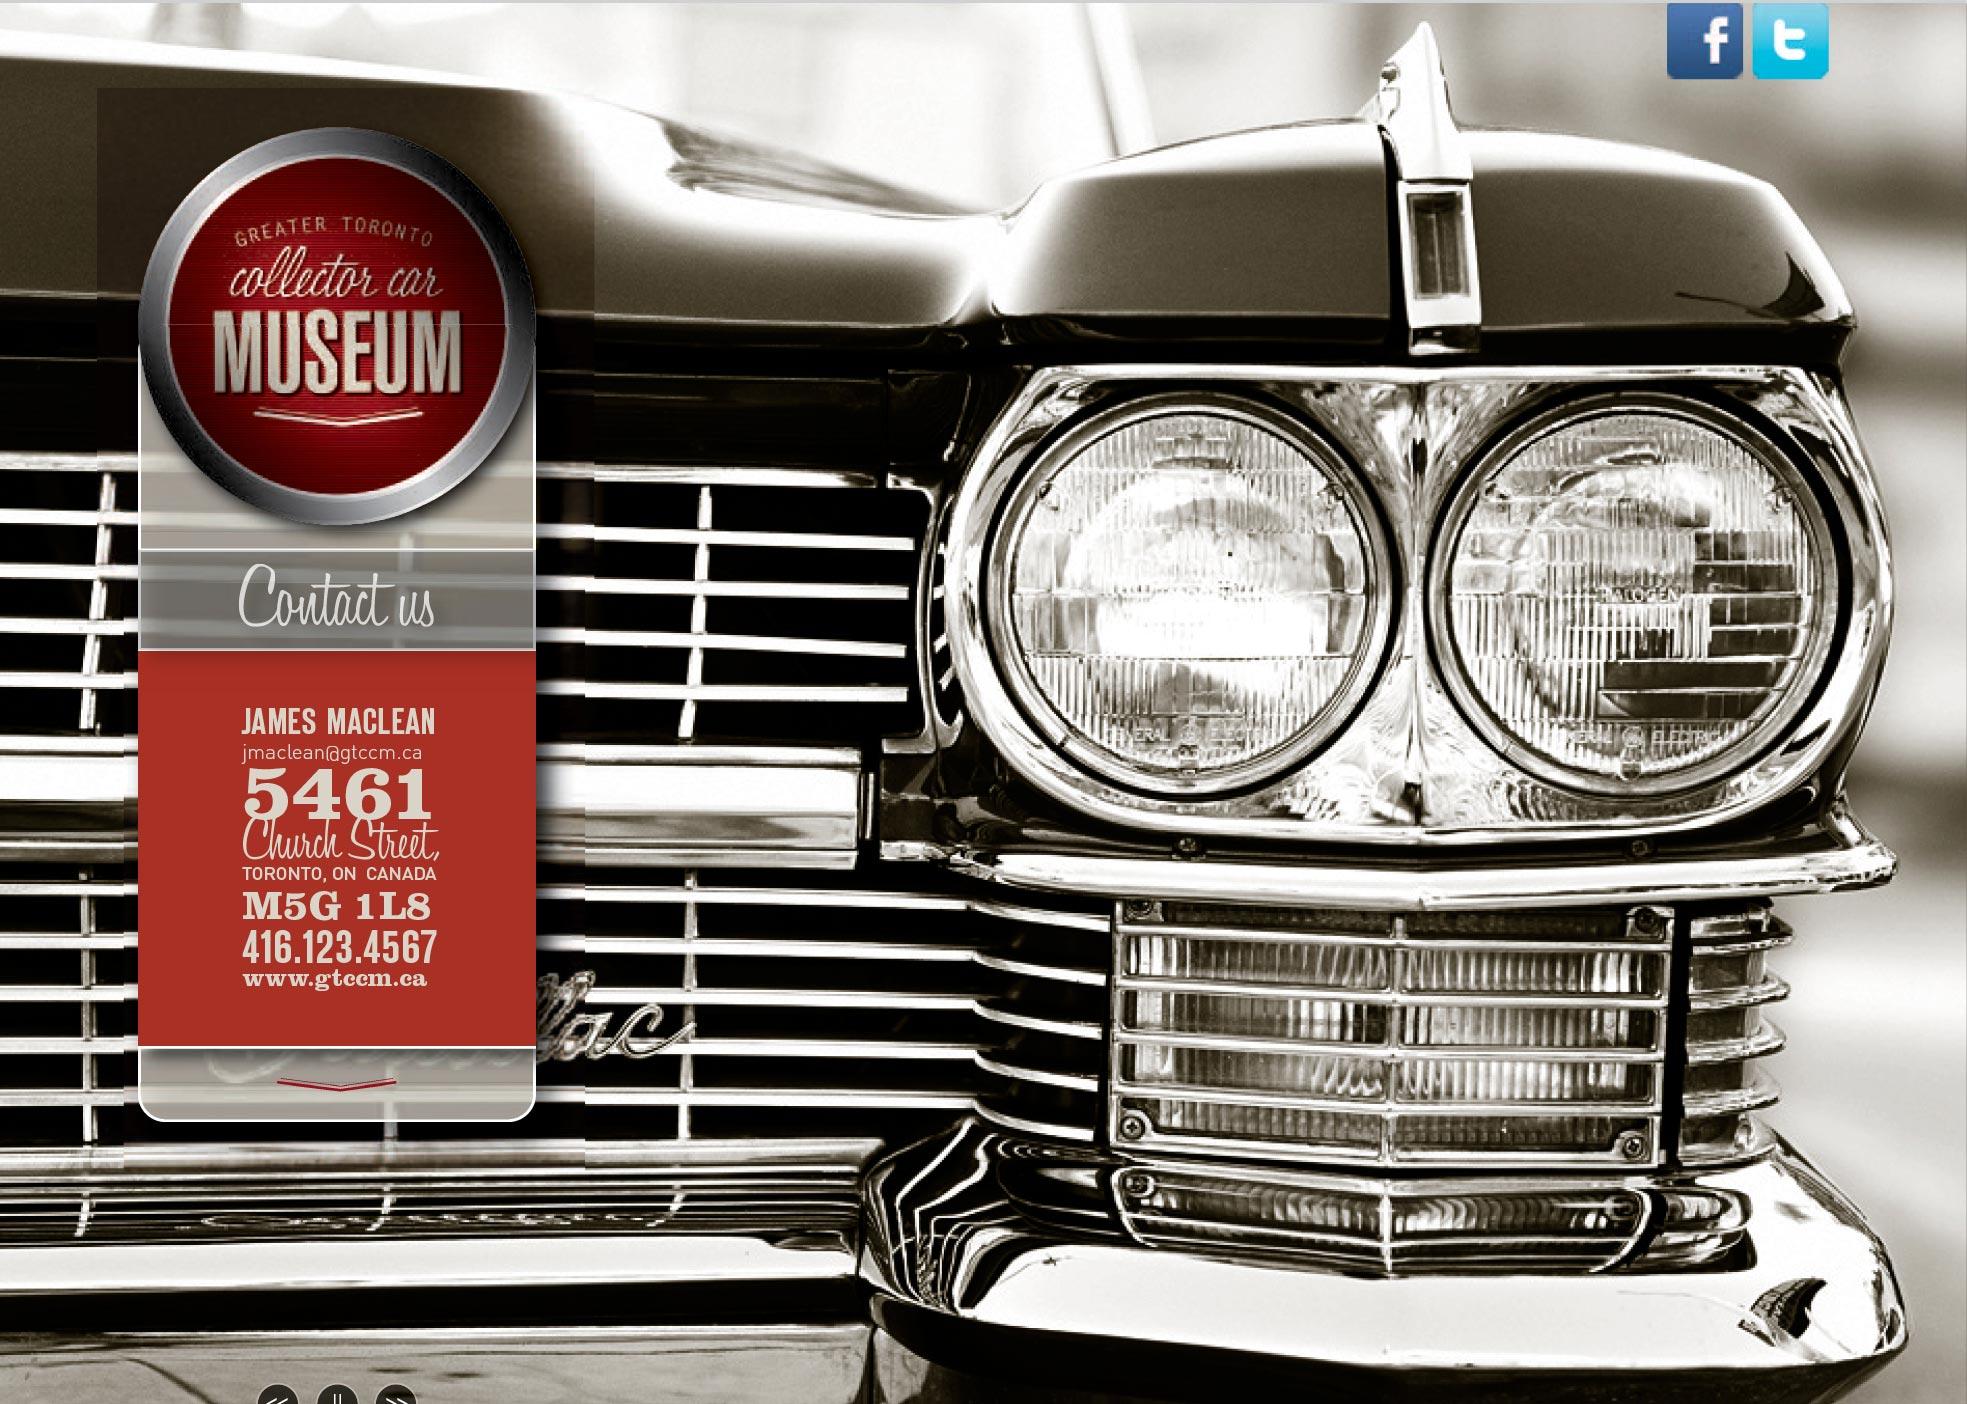 greater-toronto-collector-car-museum-website-3-sputnik-design-partners.jpg